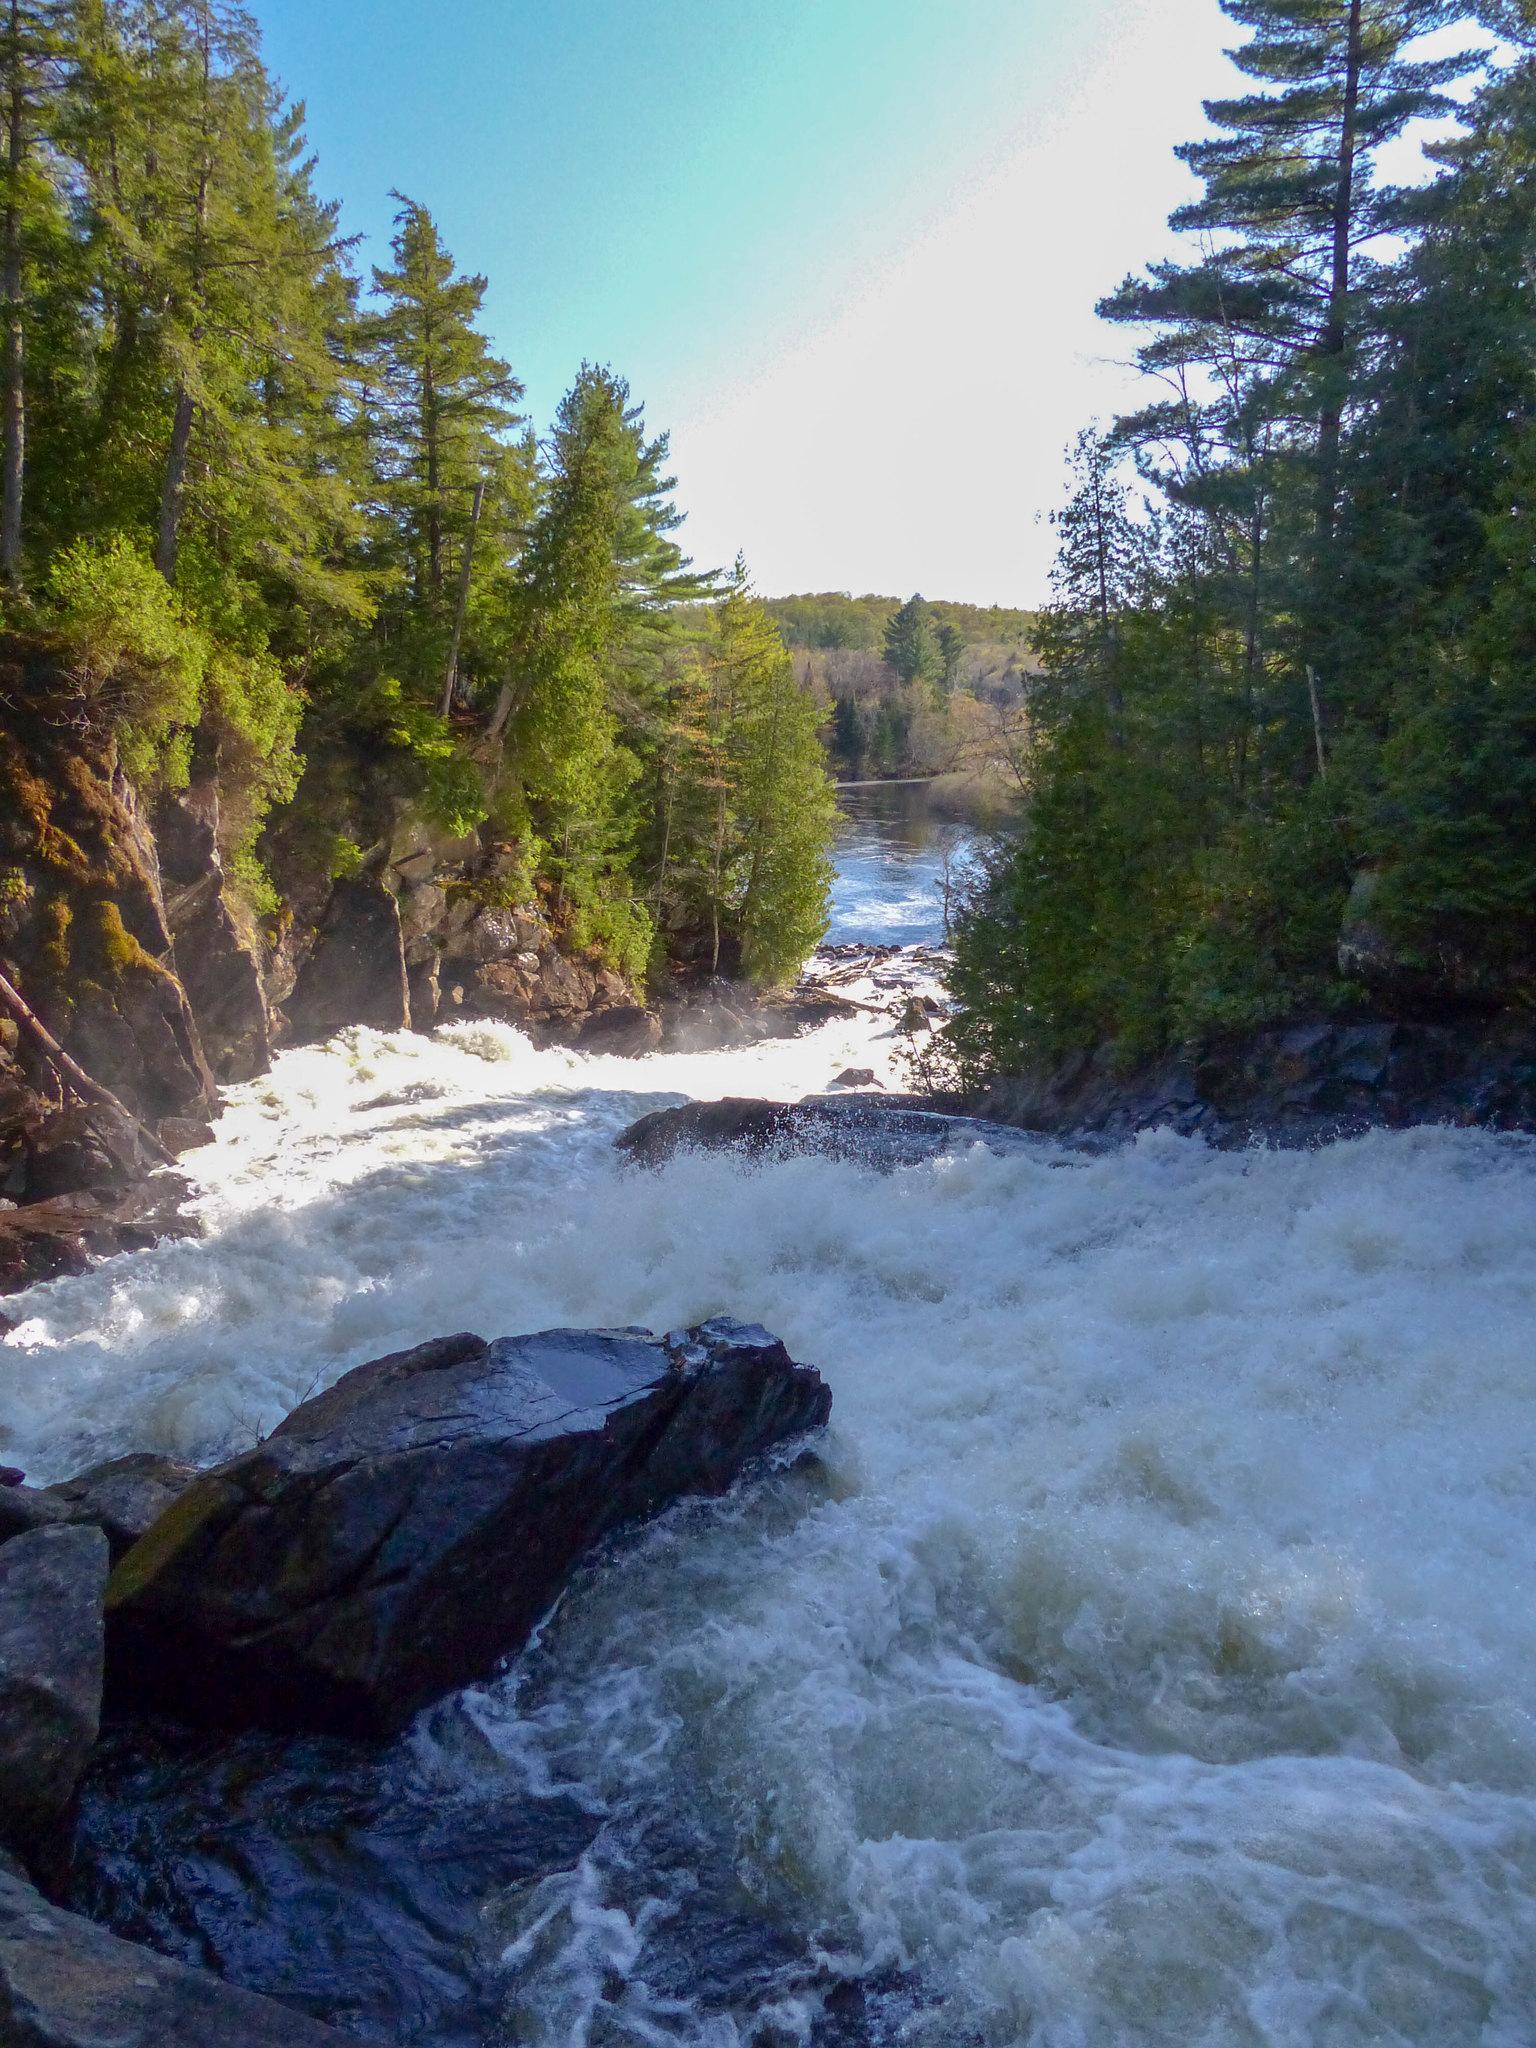 Oxtongue River - Ragged Falls Provincial Park (2)